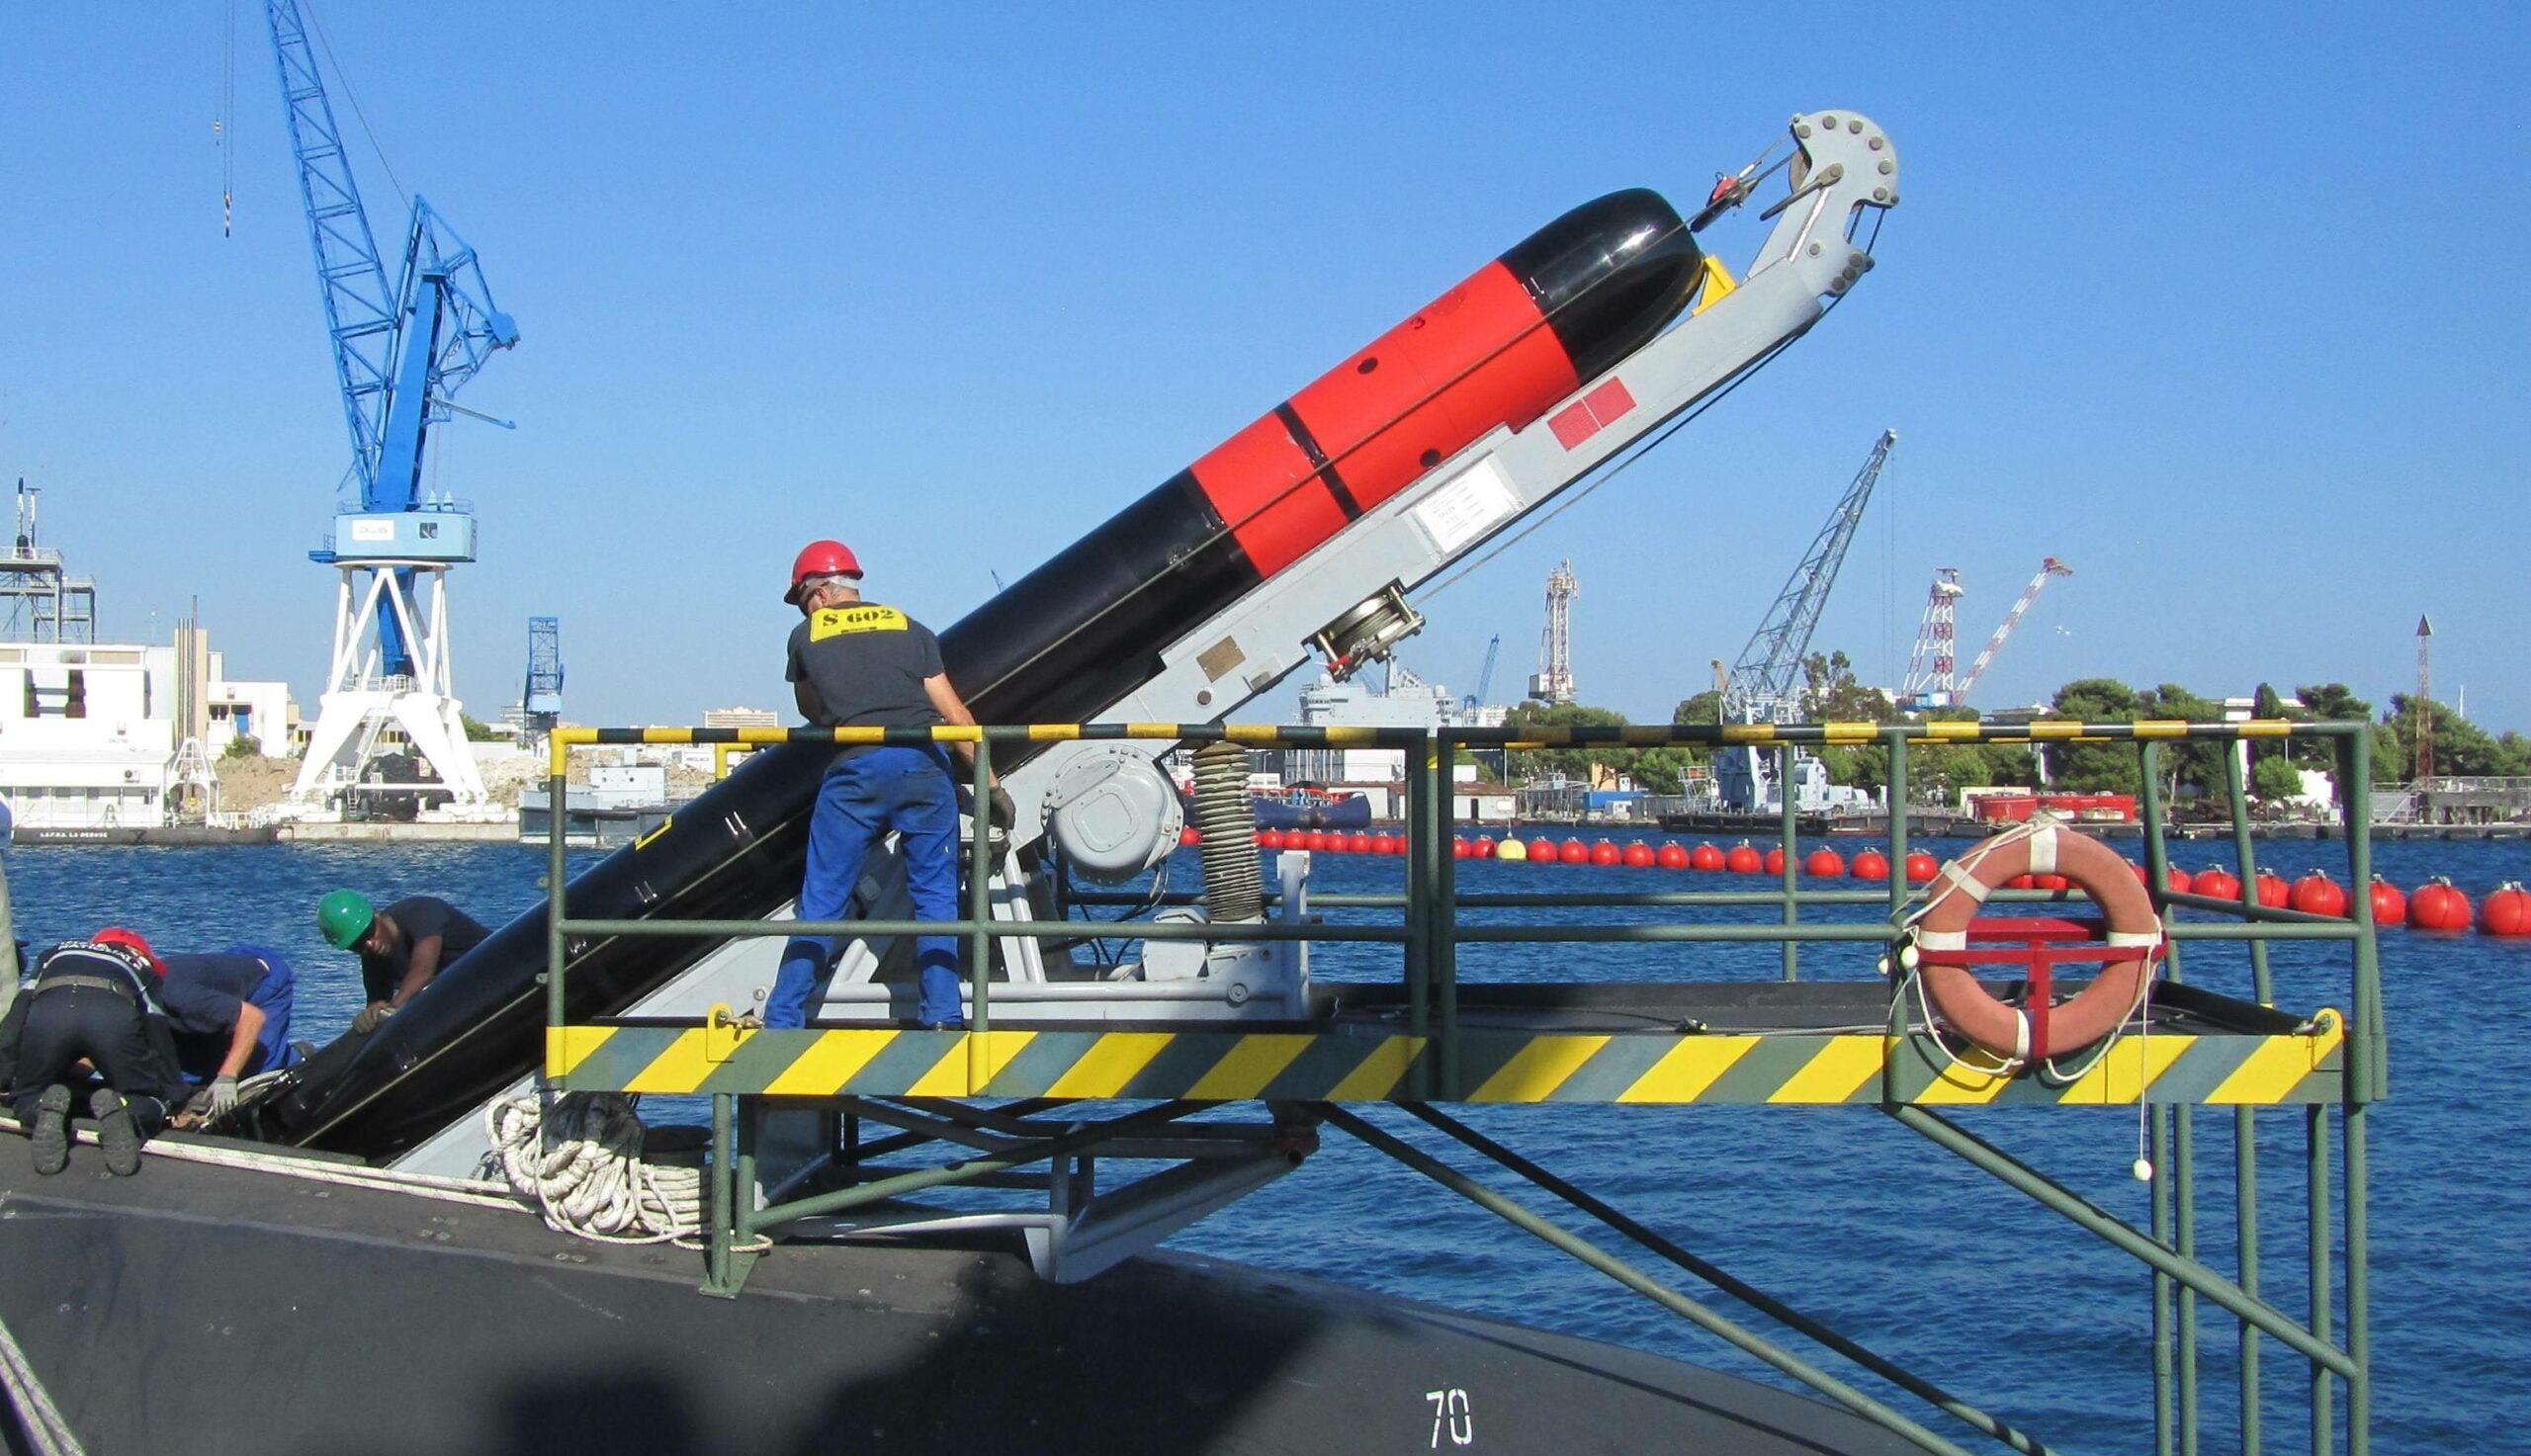 F21 torpedo